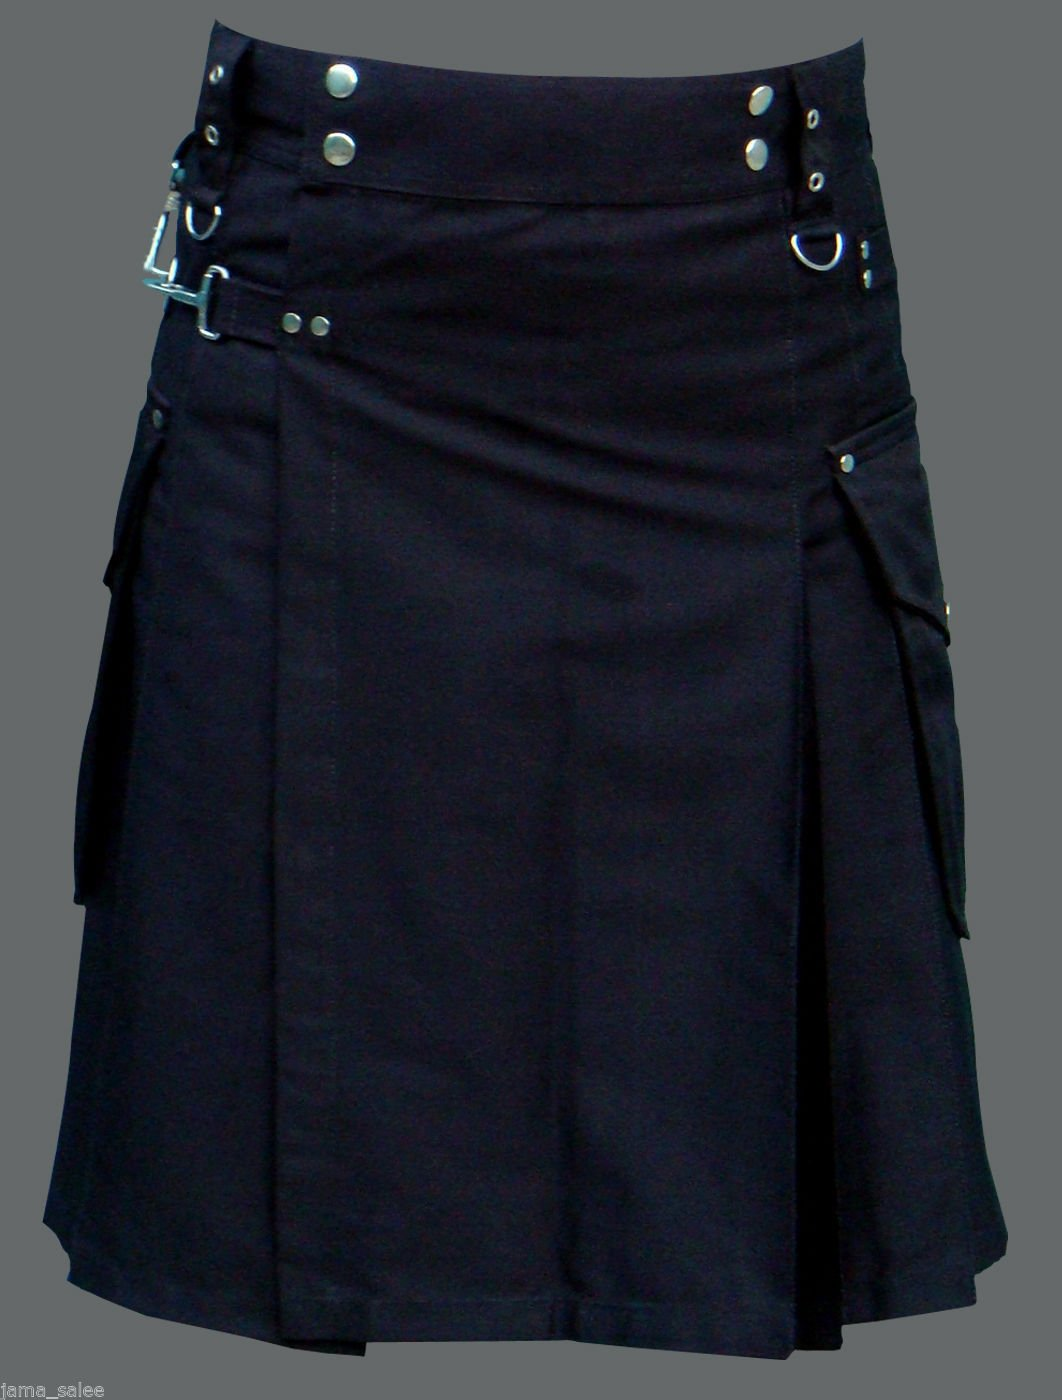 Deluxe Black Cotton Kilt Handmade Utility Gothic Modern Kilt with Cargo Pockets Waist Size 52 to Fit